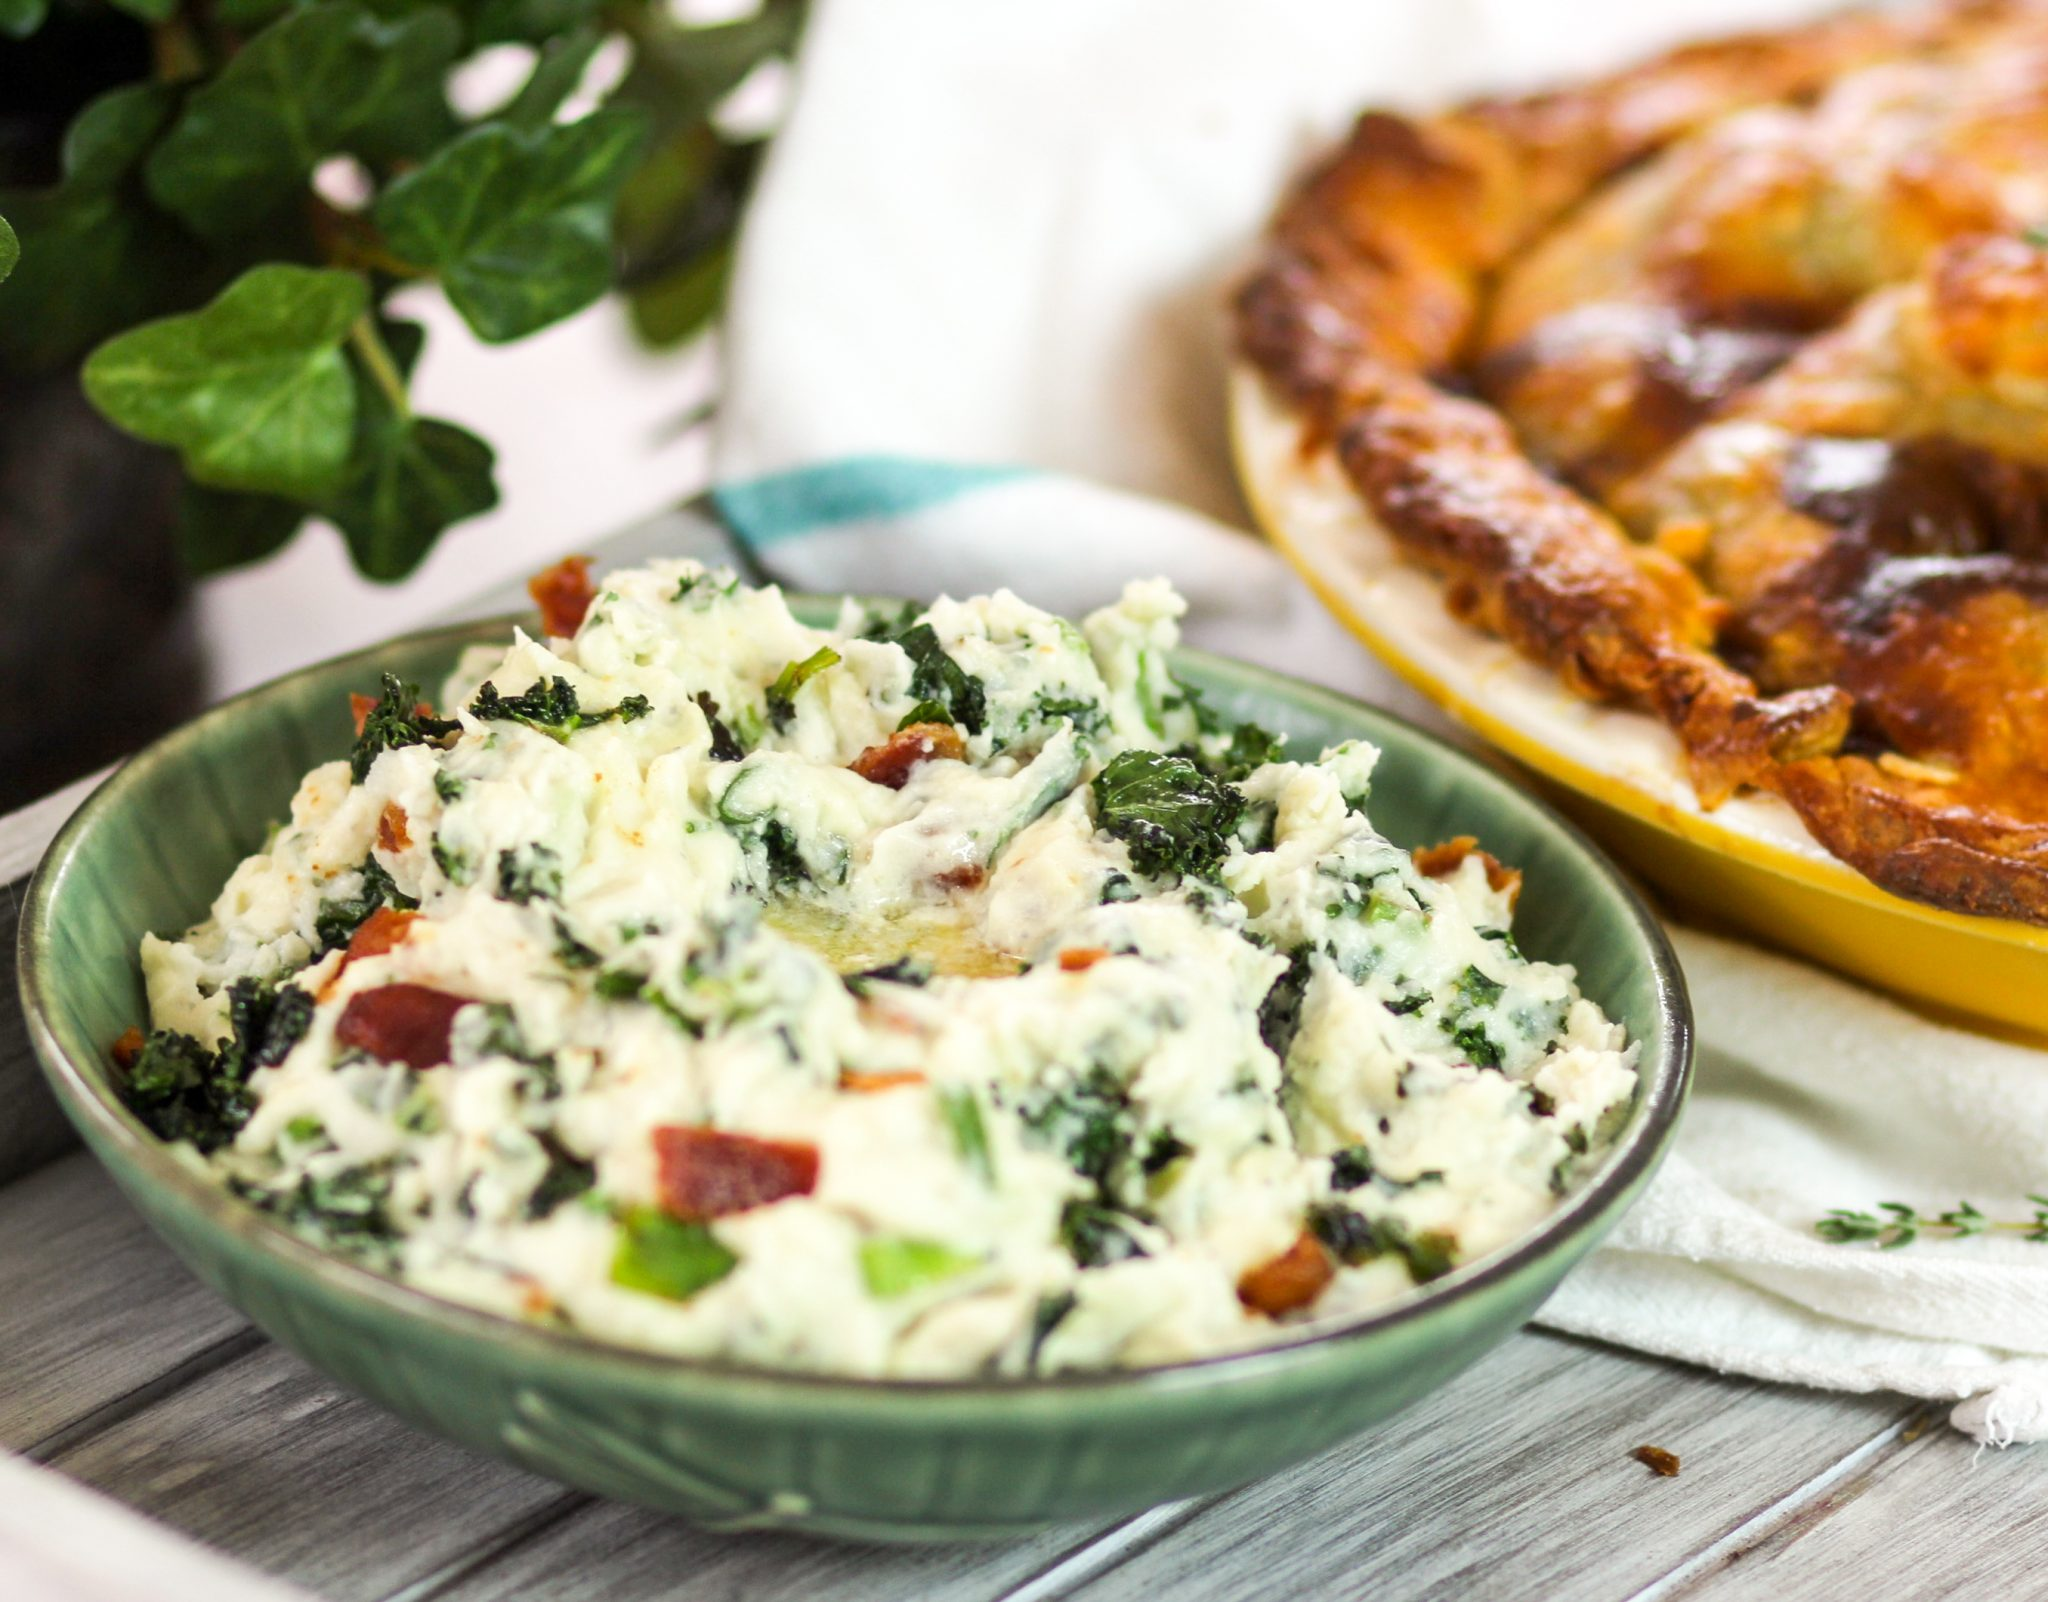 Irish Colcannon Mashed Potatoes With Kale Bacon Homemade